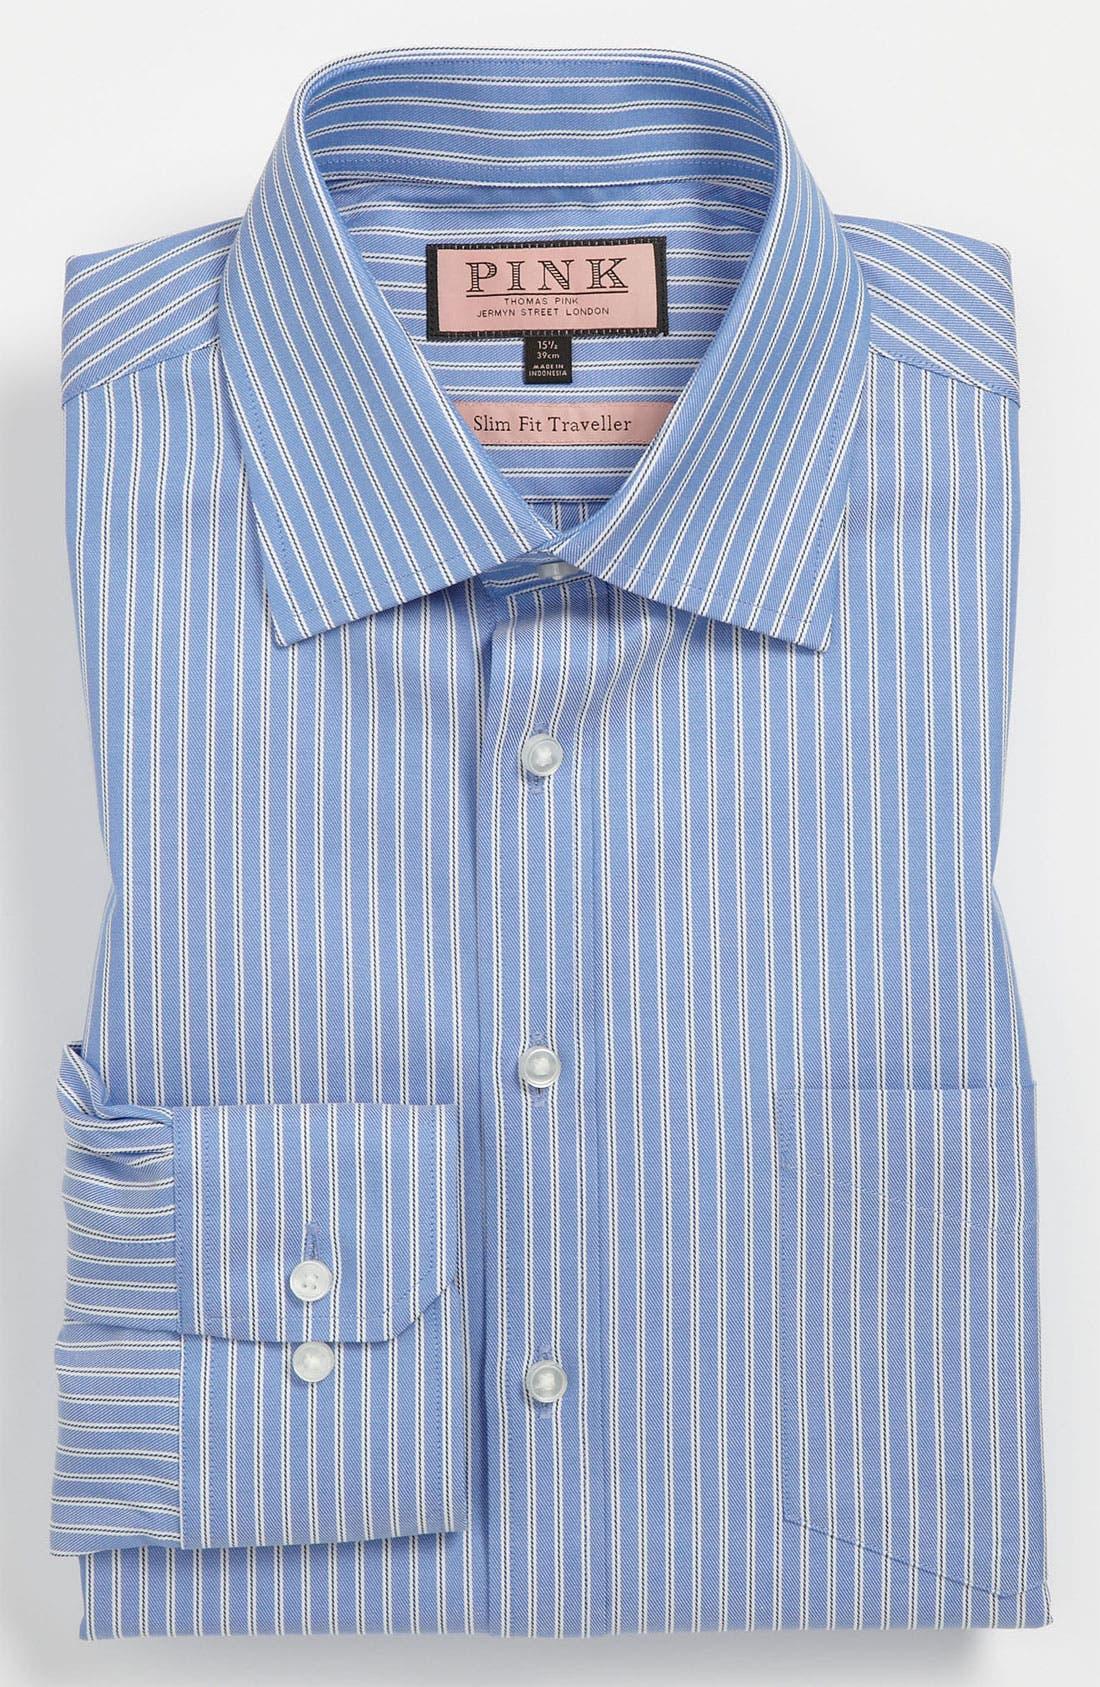 Main Image - Thomas Pink Slim Fit Traveller Dress Shirt